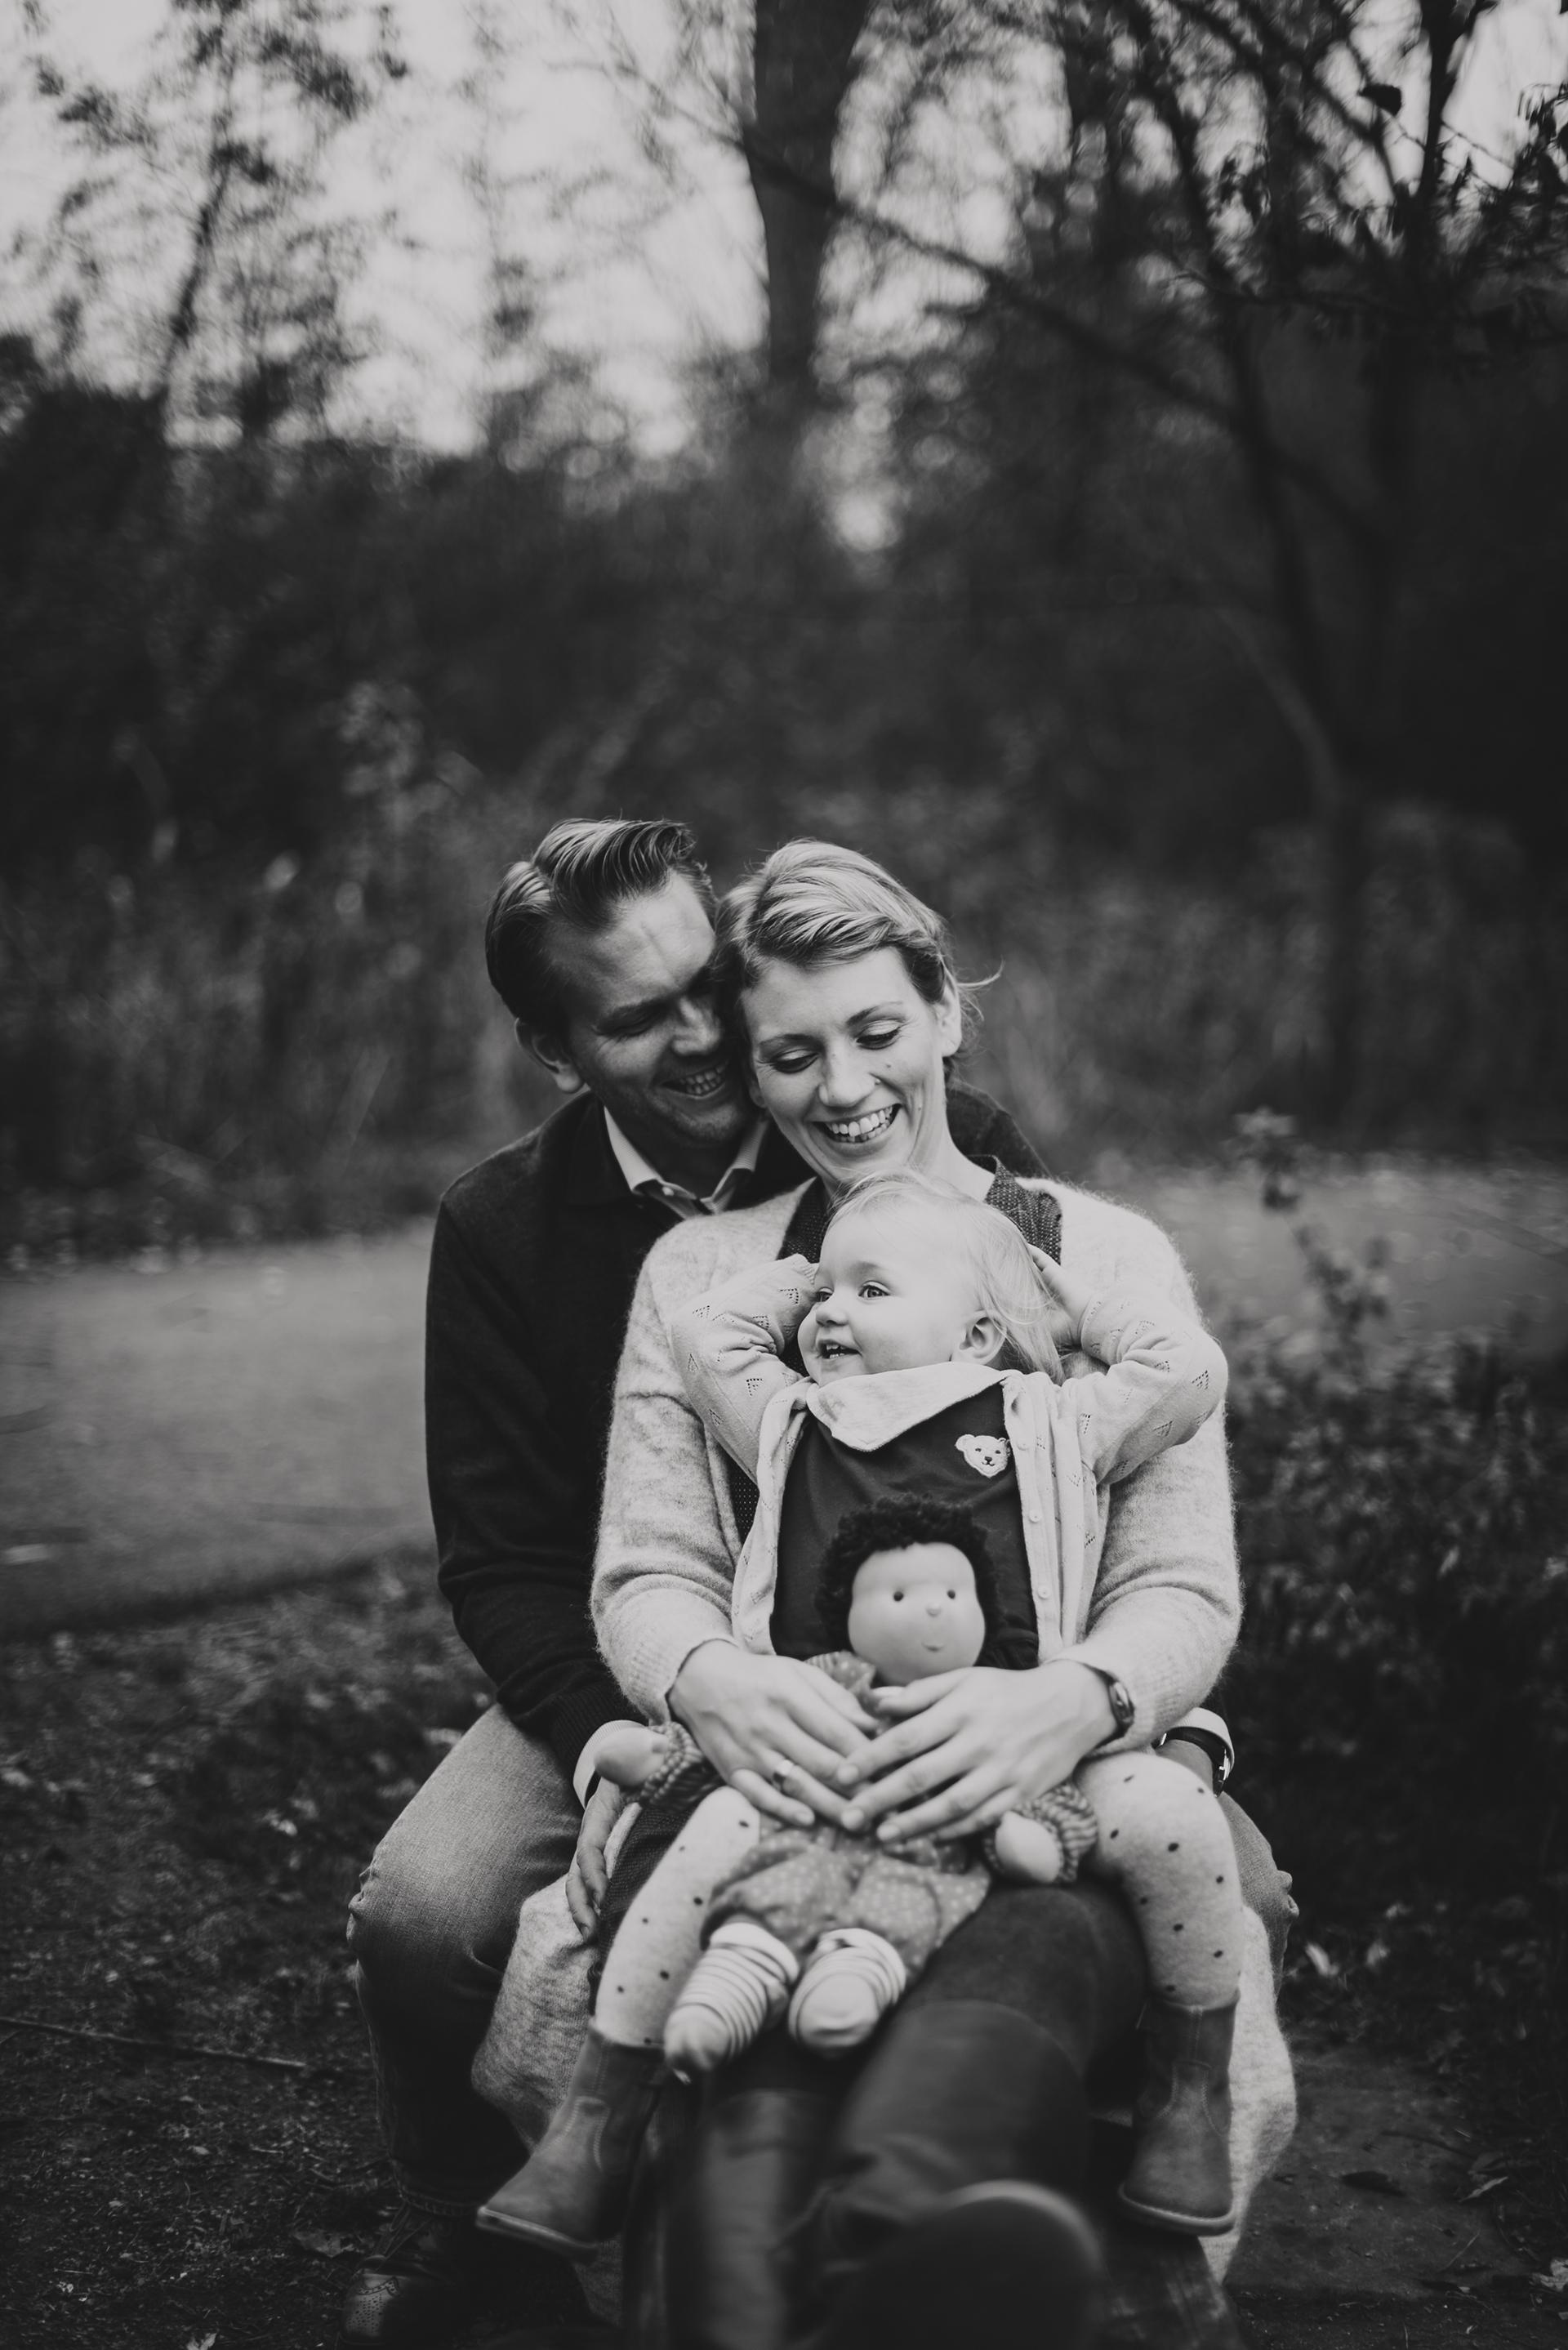 Familienshooting_FF_012_Caroline Queda Fotografie